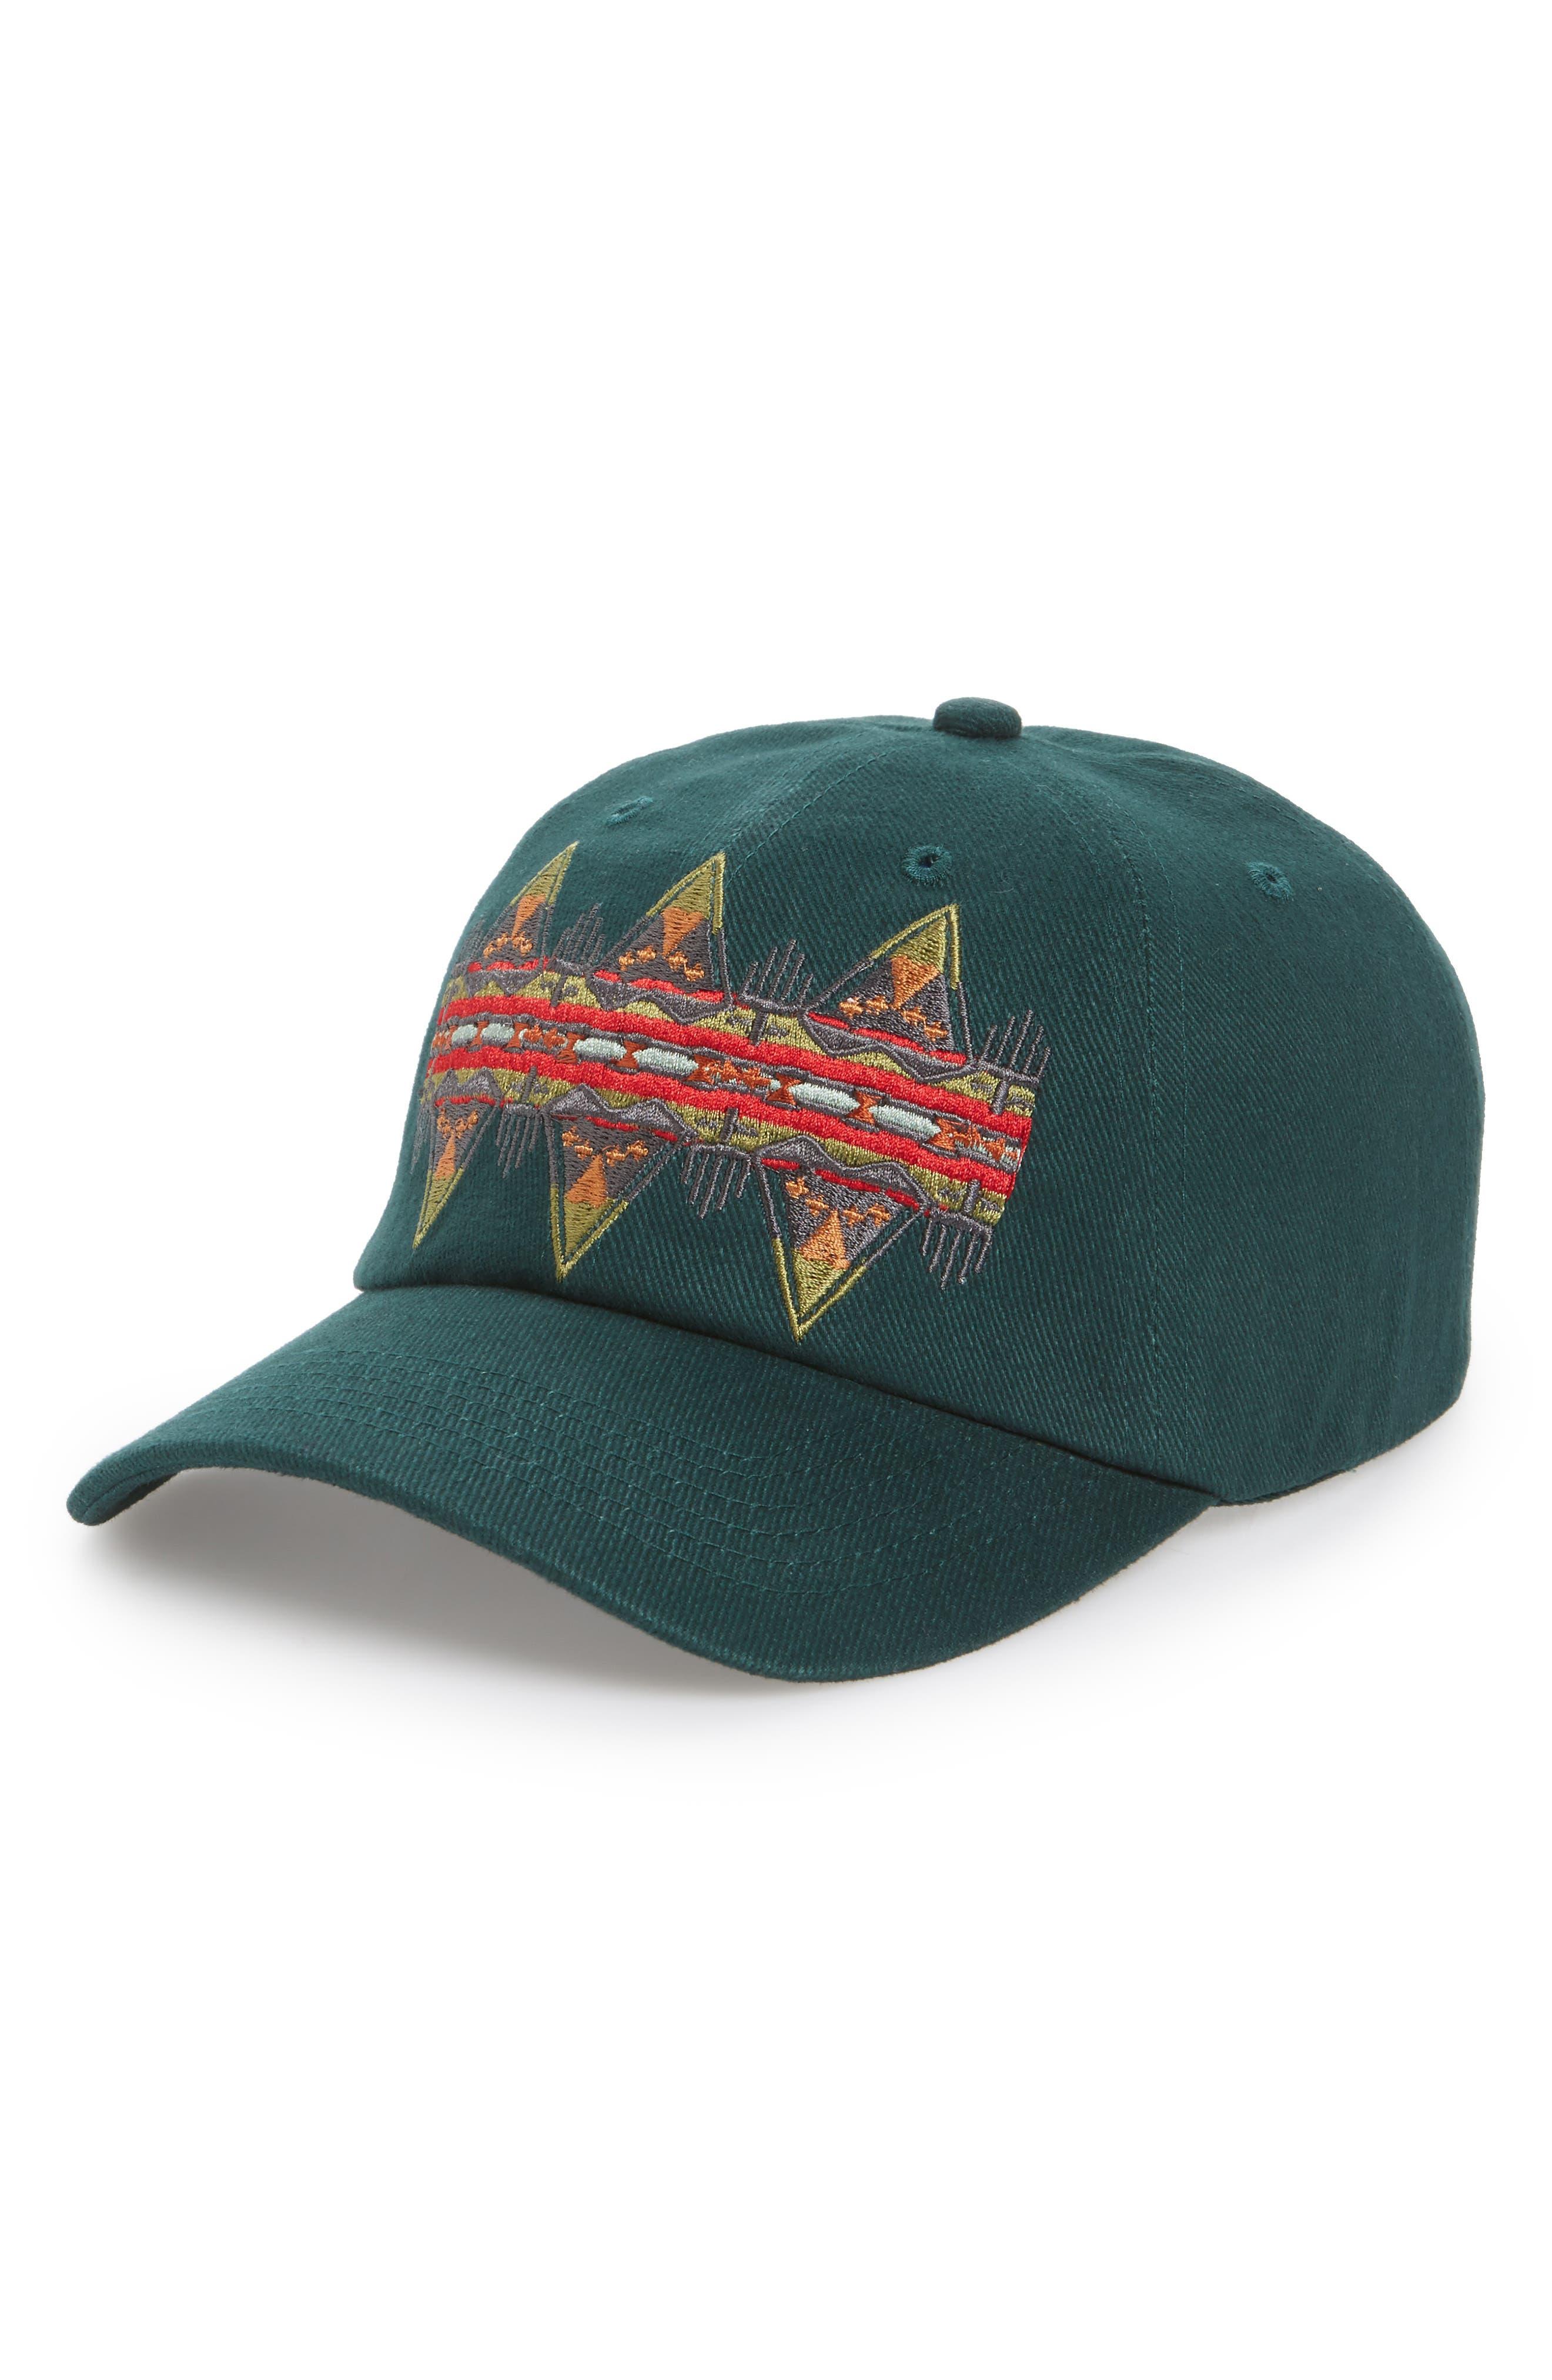 Main Image - Pendleton Embroidered Ball Cap